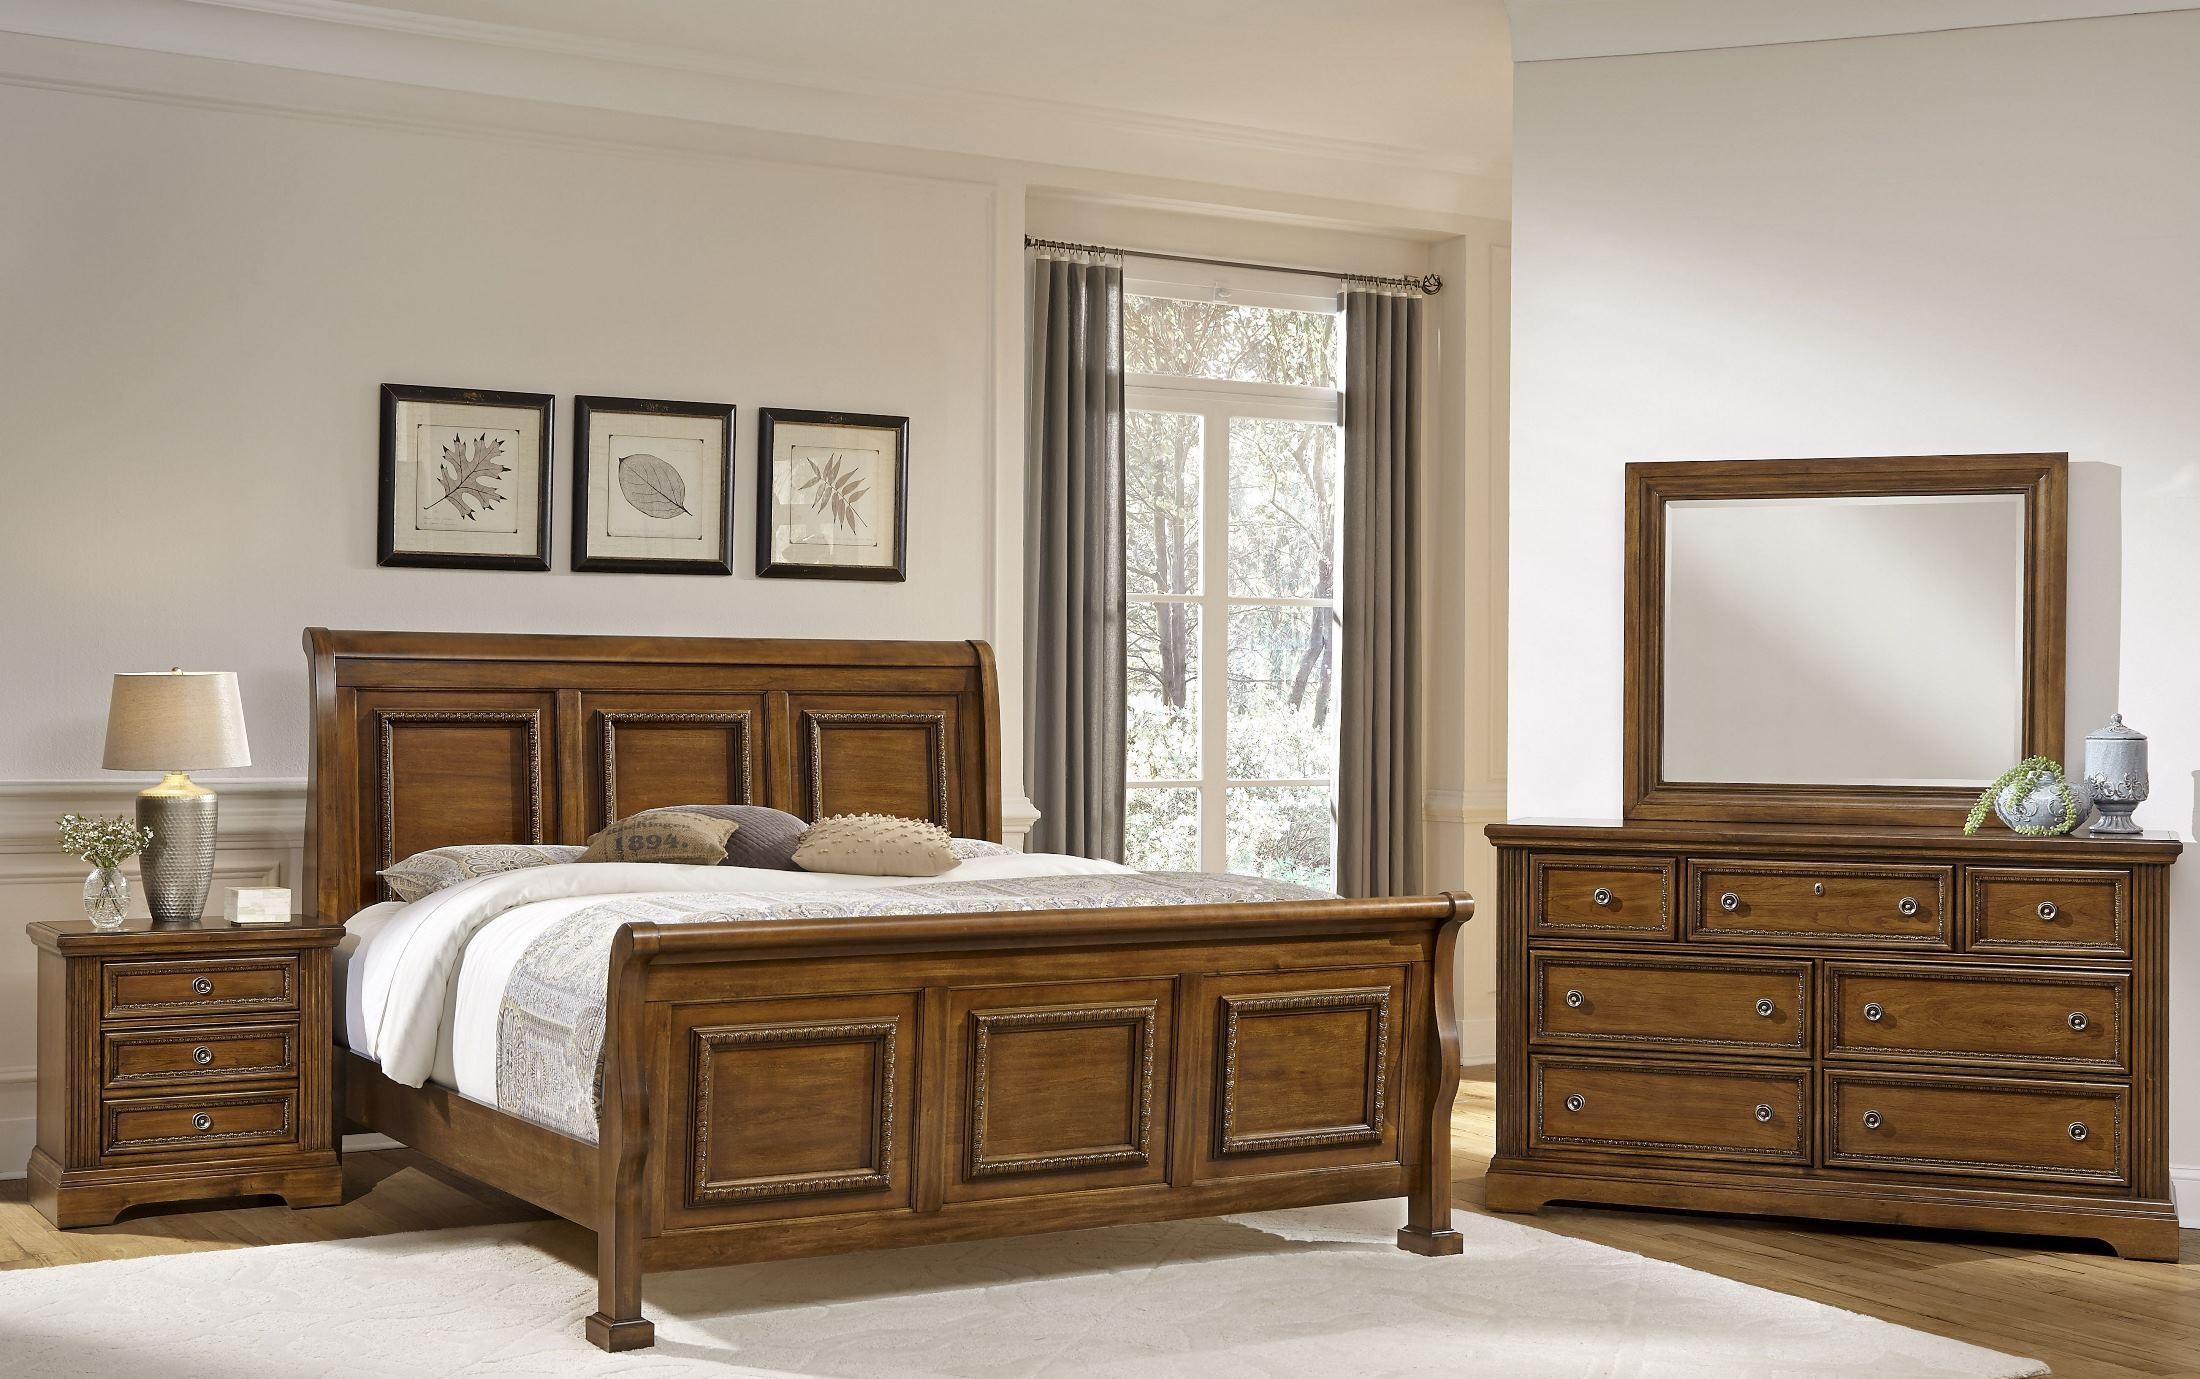 Affinity Antique Cherry Sleigh Bedroom Set 562 553 355 722 Vaughan Bassett